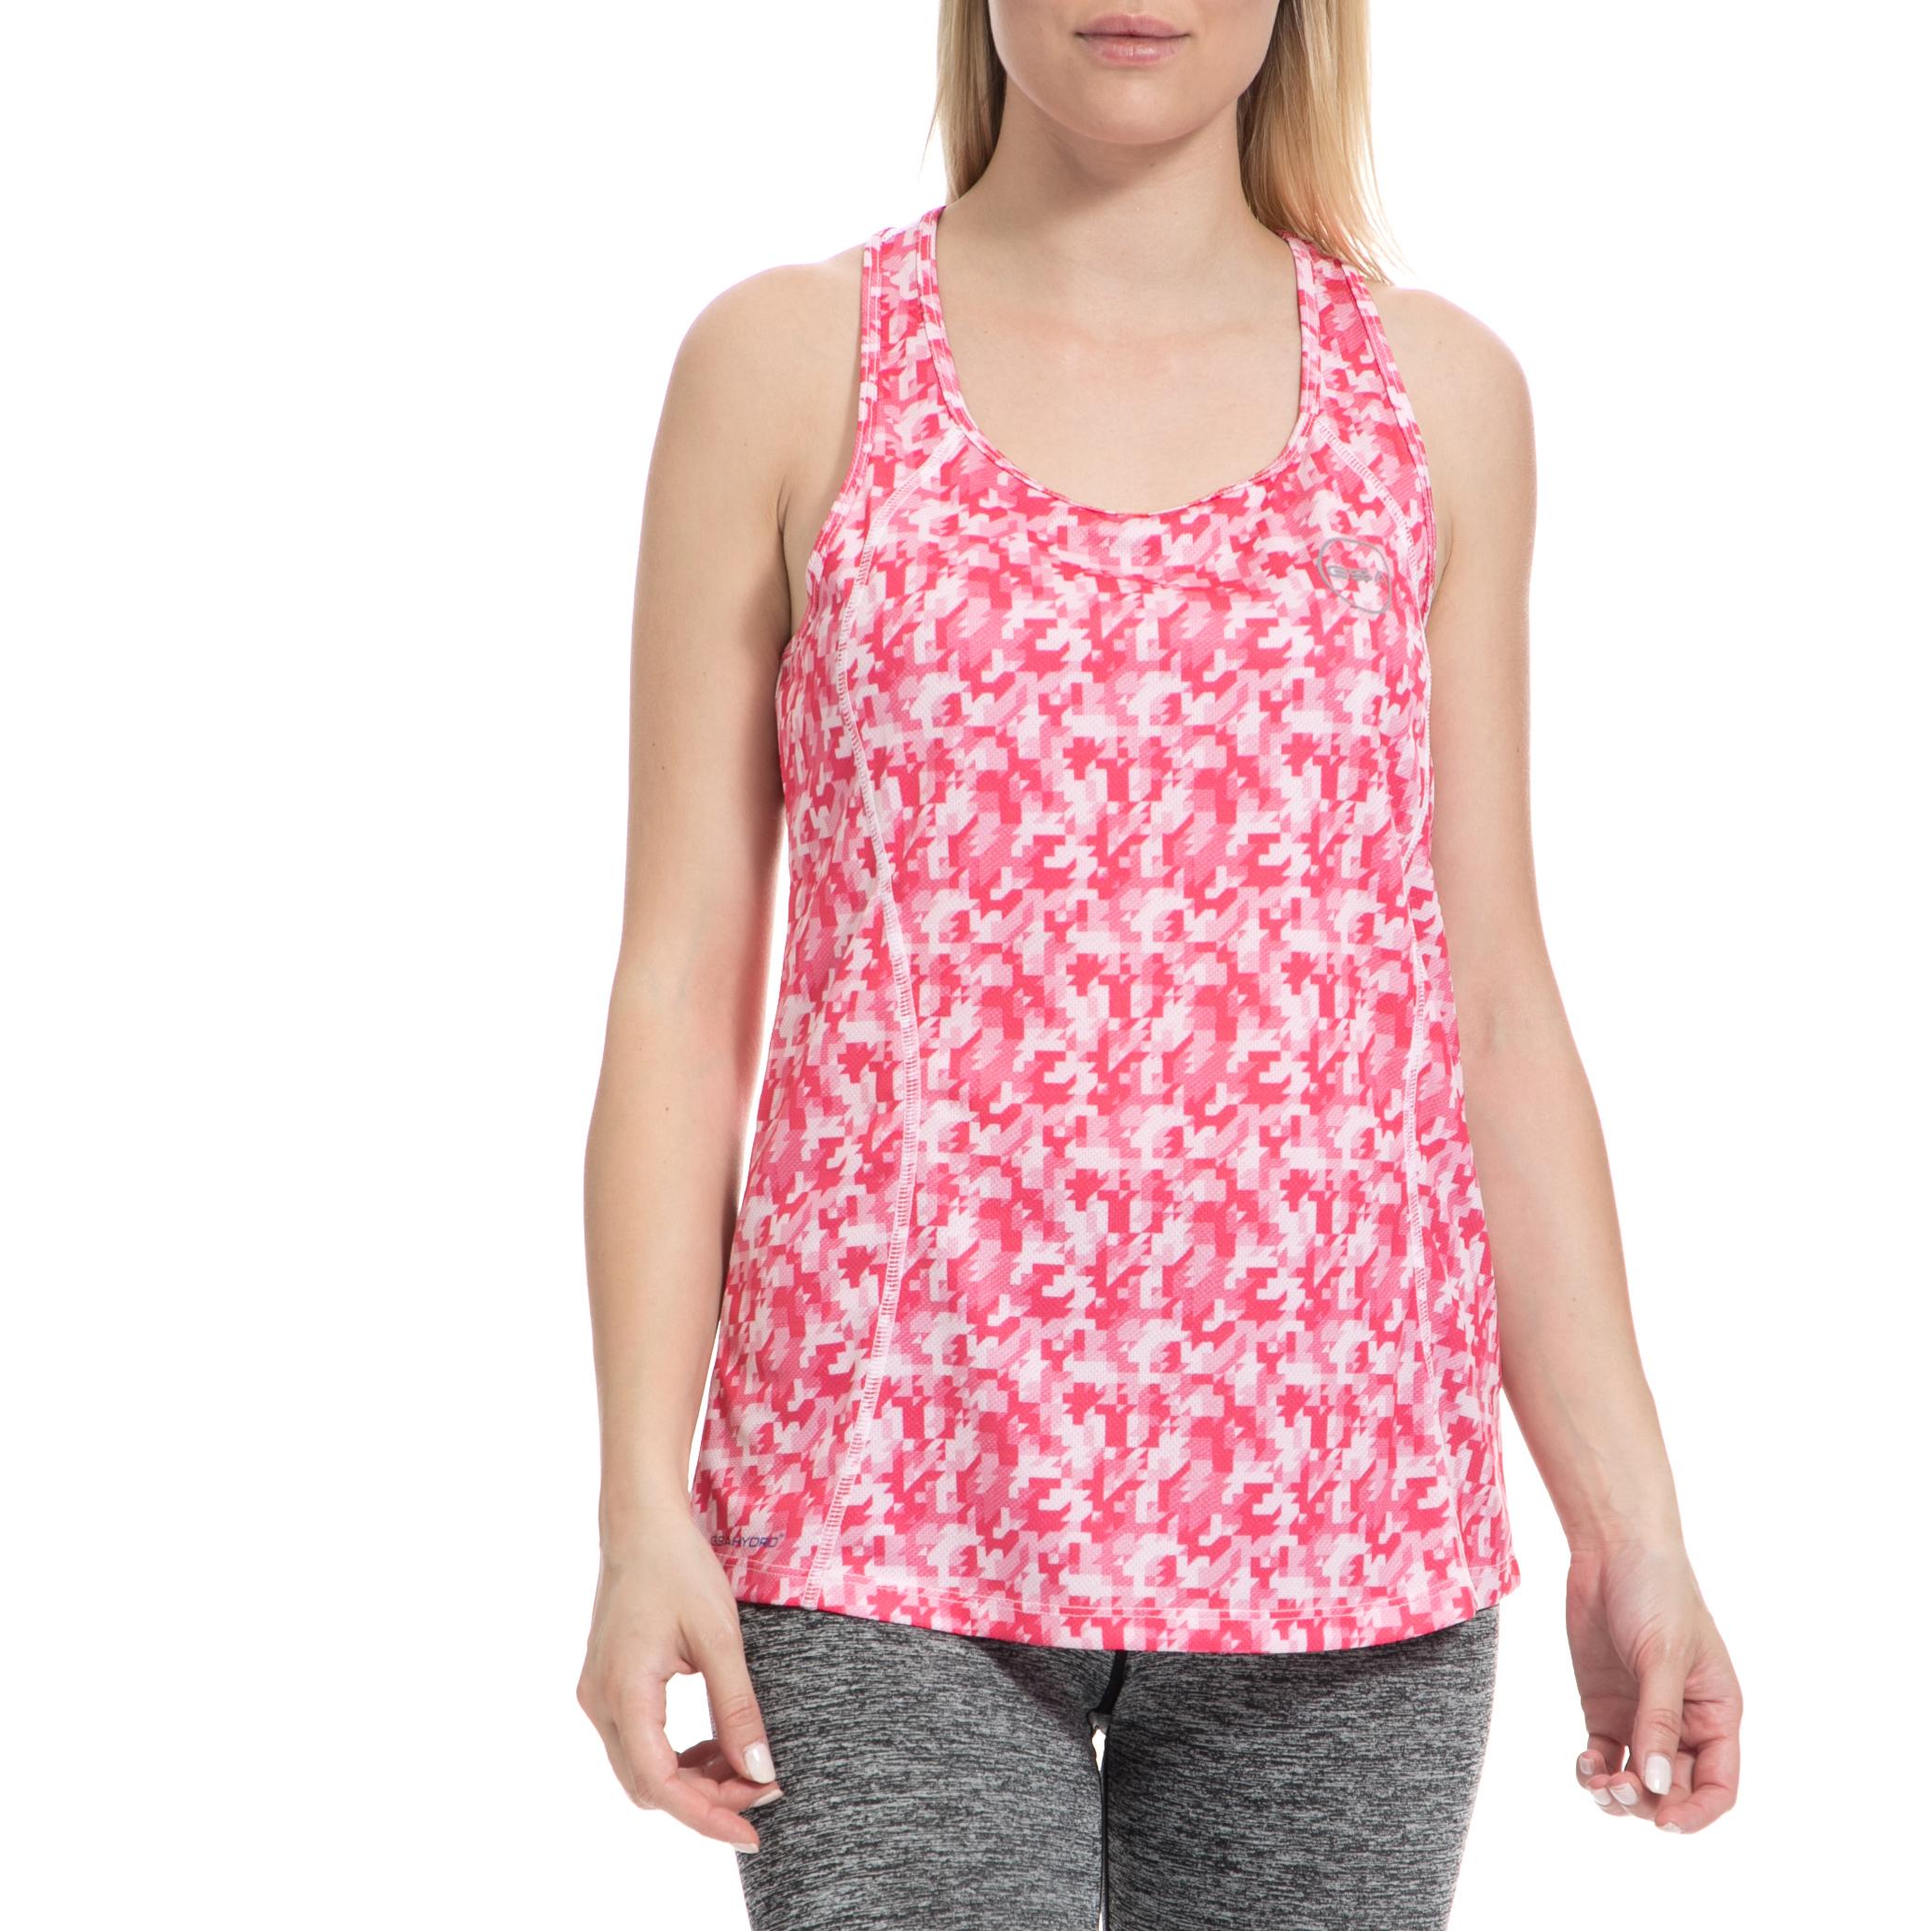 GSA - Γυναικεία μπλούζα GSA ροζ γυναικεία ρούχα αθλητικά t shirt τοπ